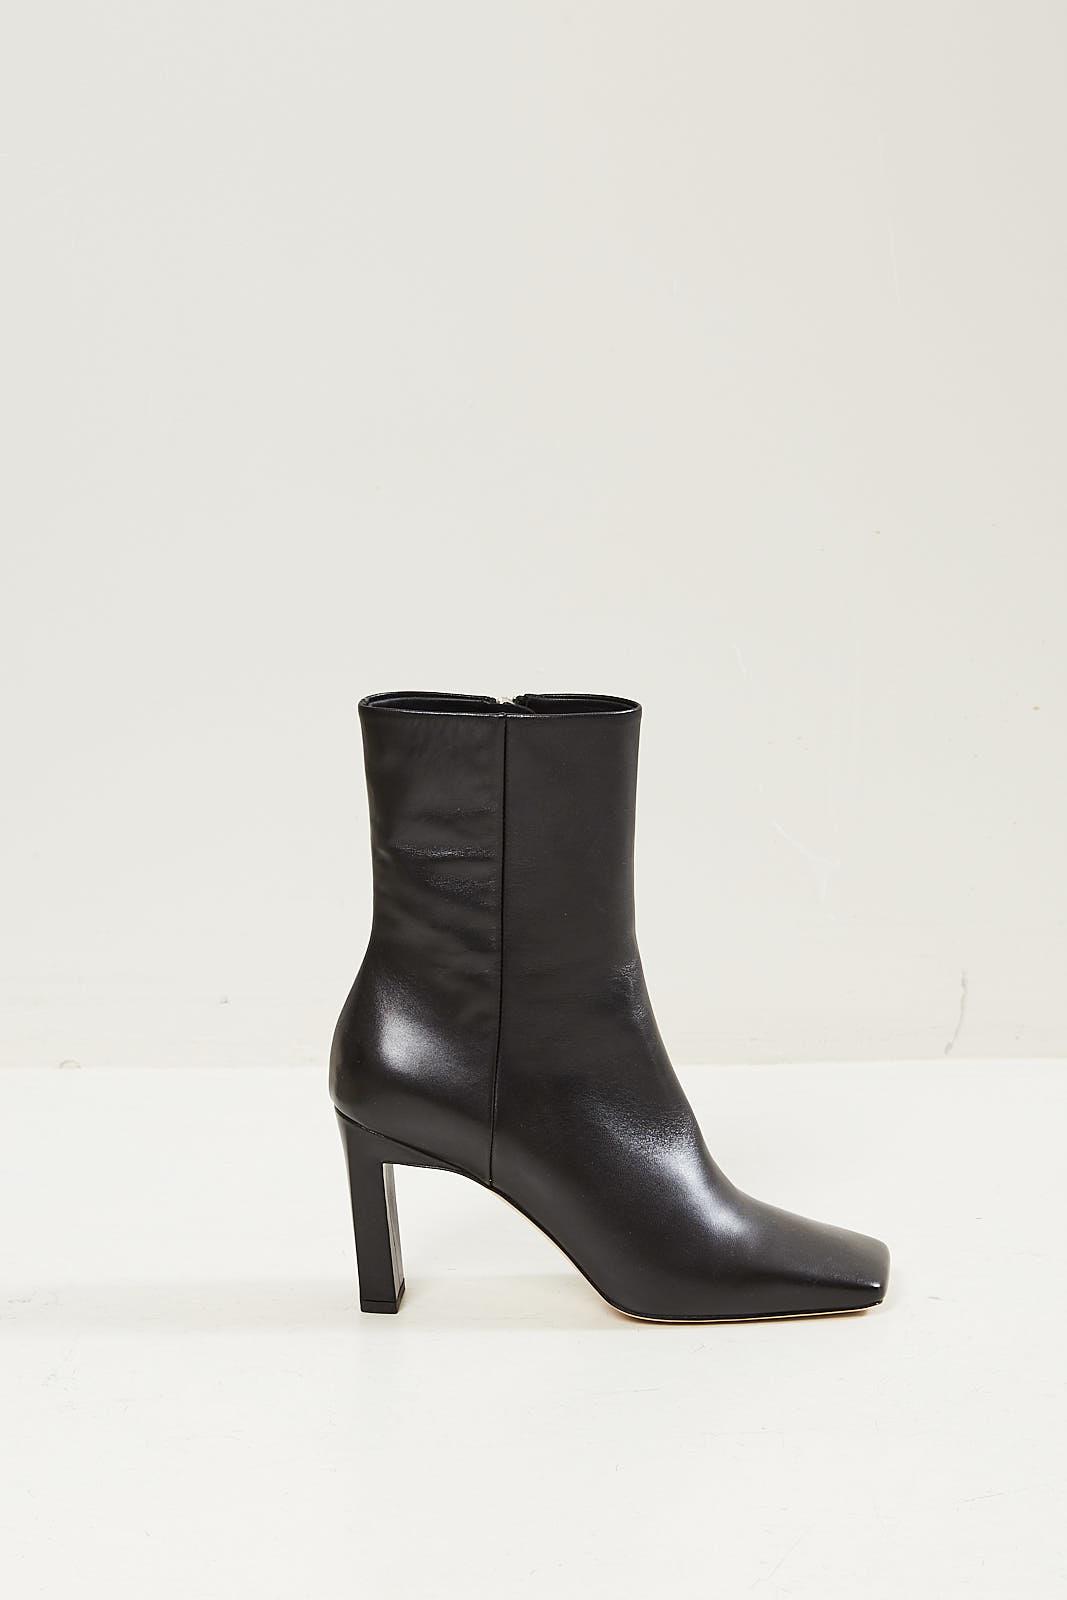 Wandler - Isa short leather boot black